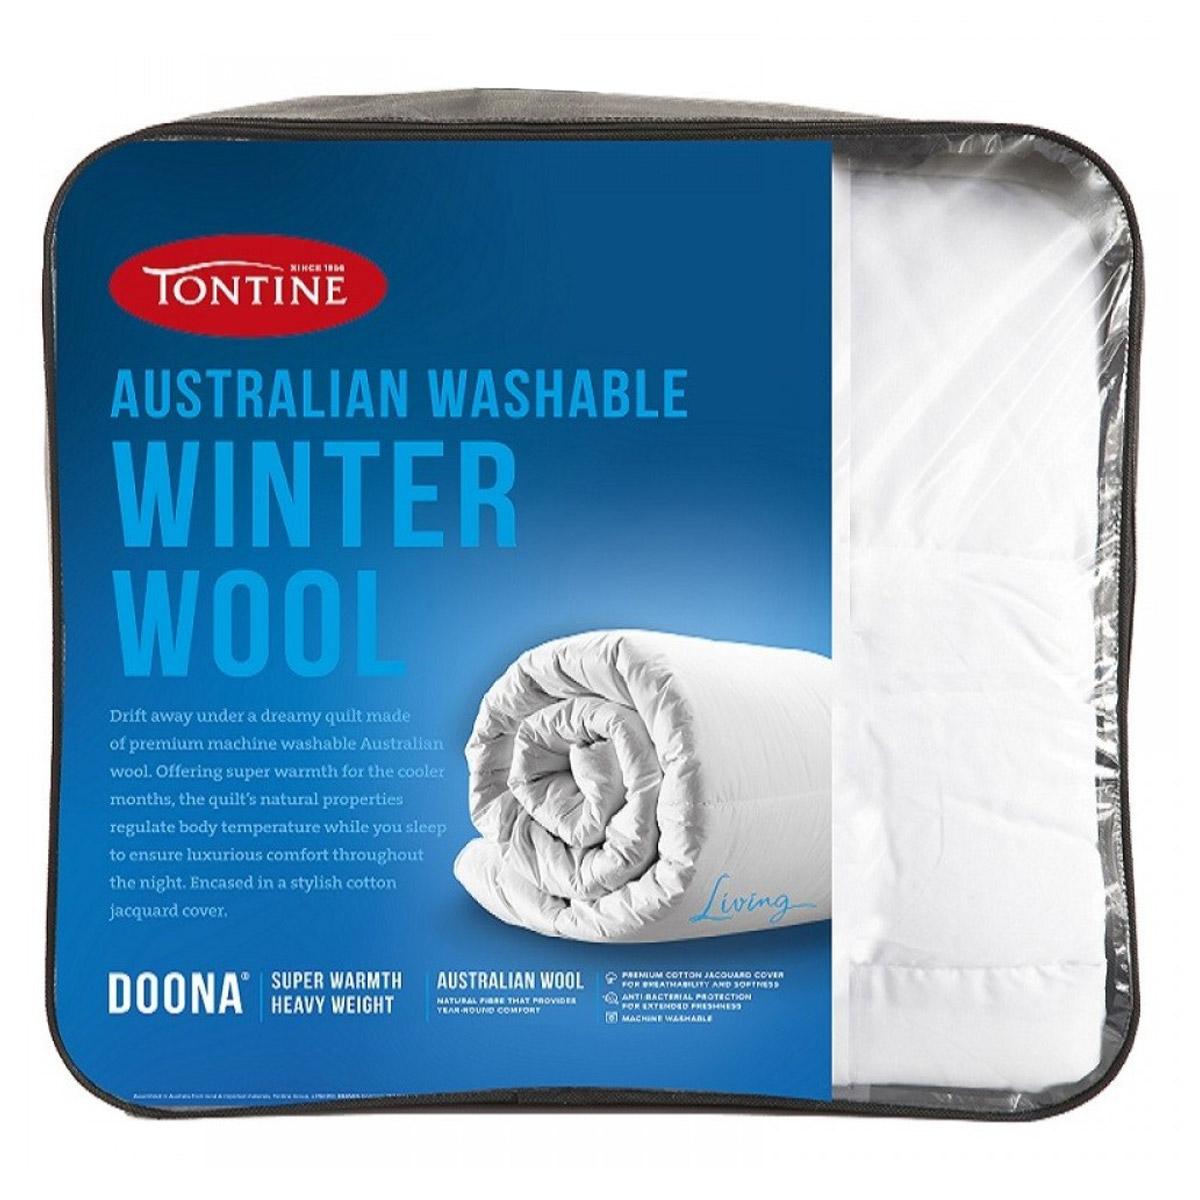 Tontine Washable Australian Winter Wool Doona 500gsm